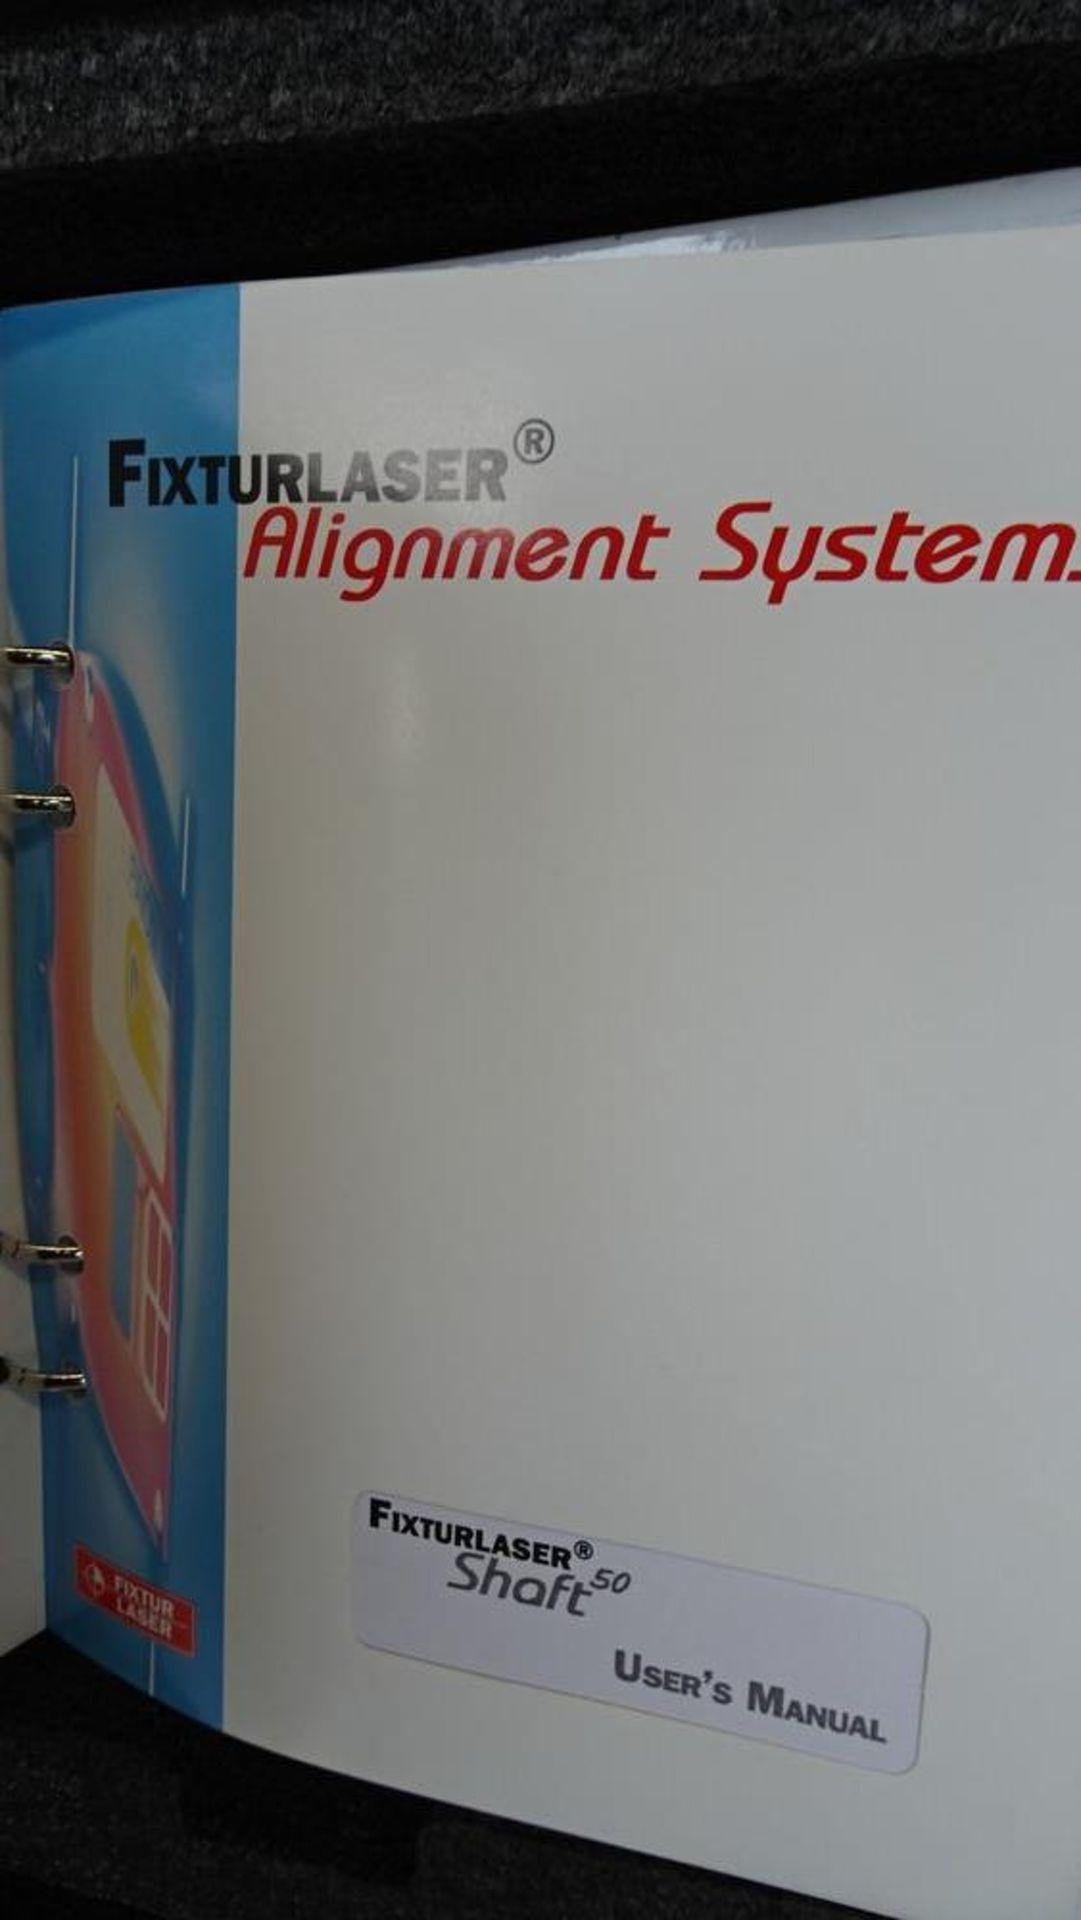 Lot 34 - FIXTURLASER ALIGNMENT SYSTEM SHAFT 50 TYPE, C/W CASE